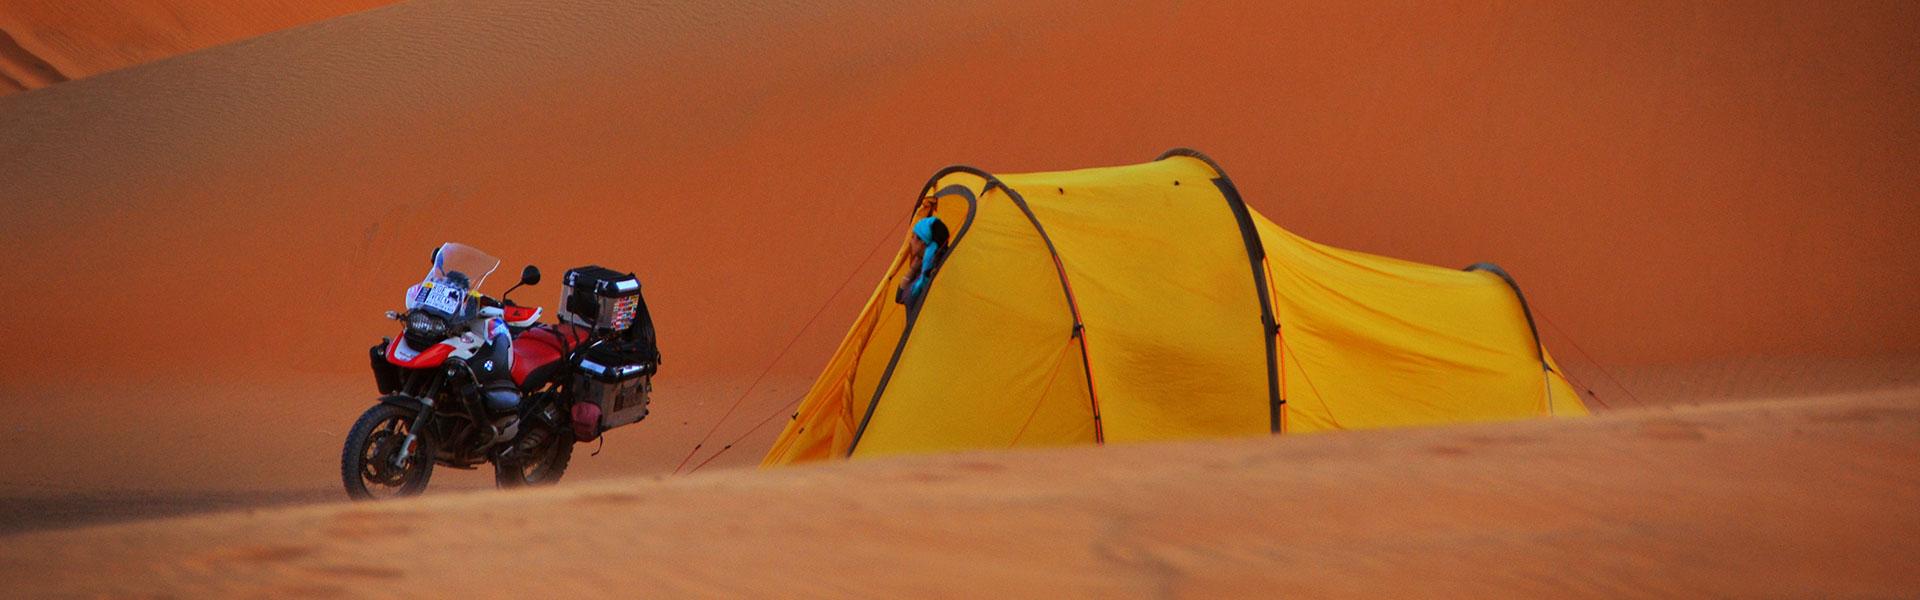 Redverz Gear Atacama Expedition Motorcycle Tent Moroccan Desert